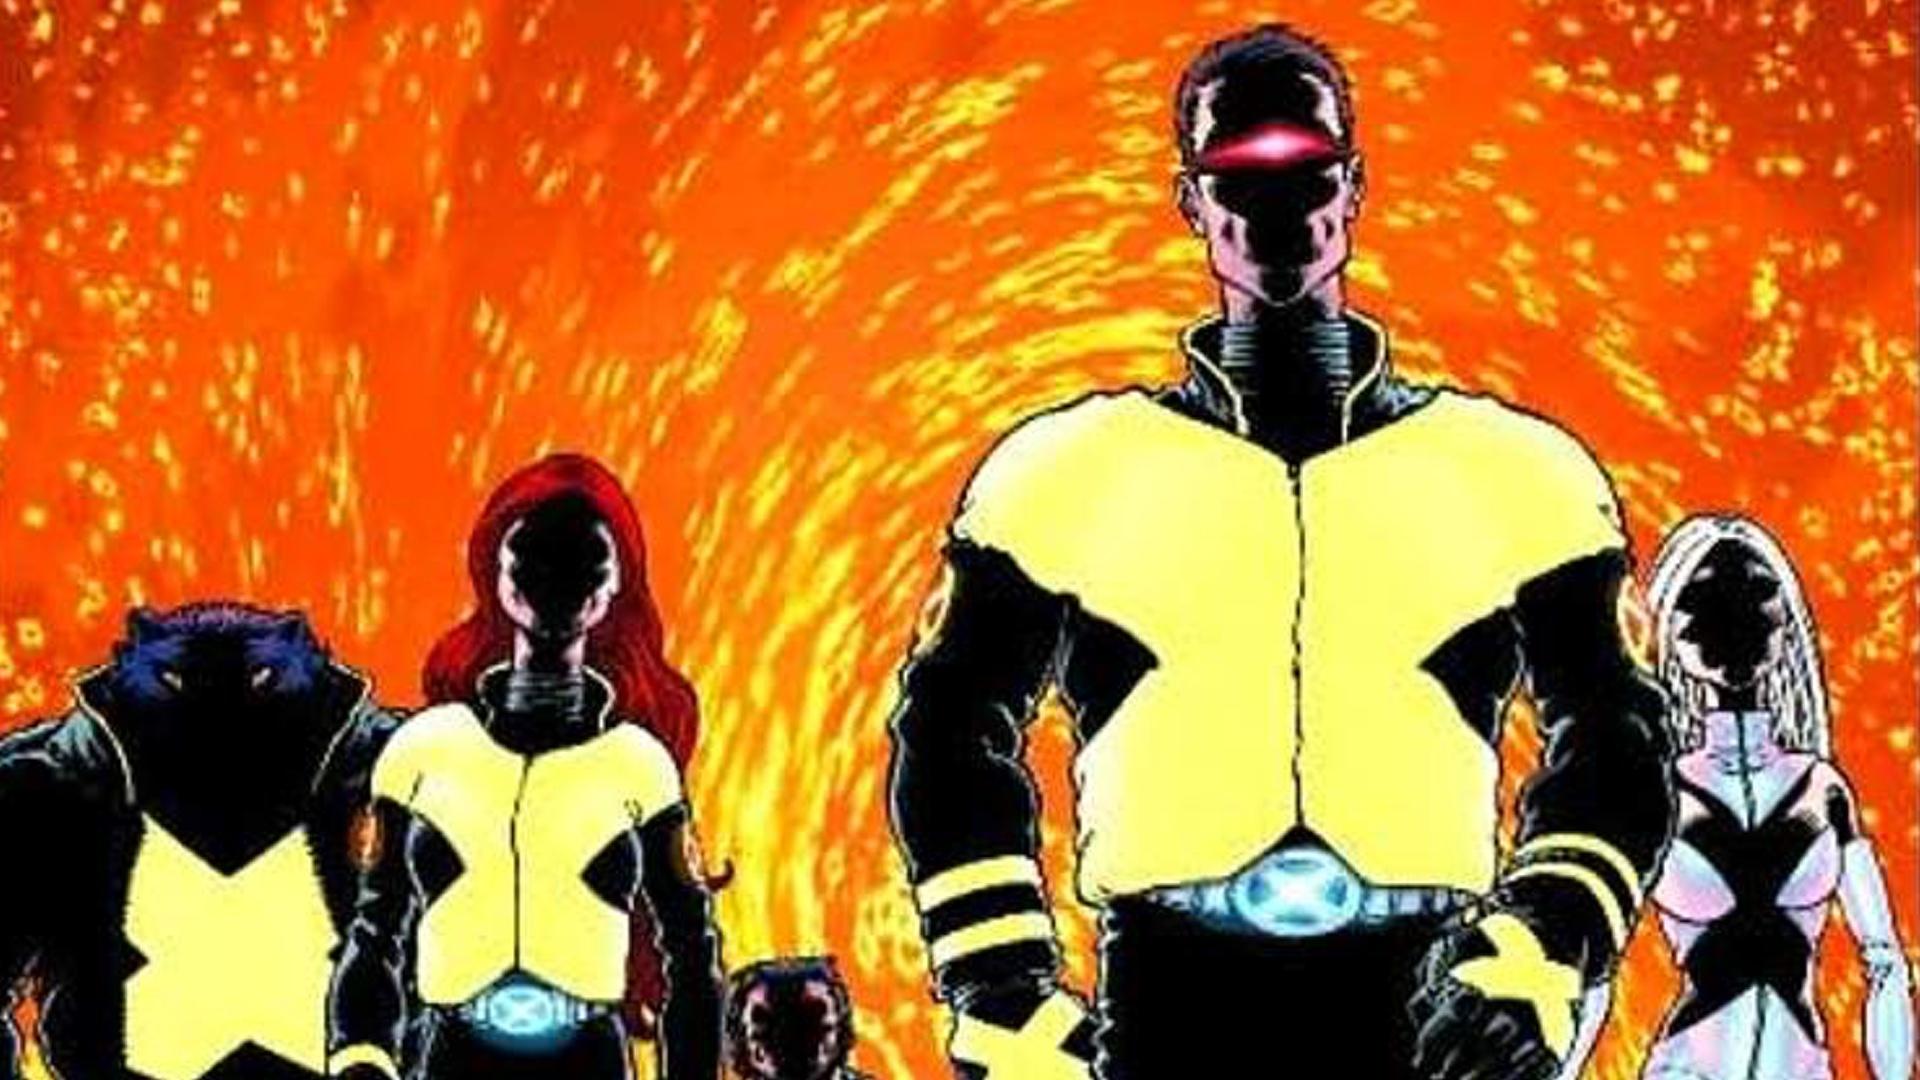 X Men Dark Phoenix Set Photo Shows Us The Team In Their Comic